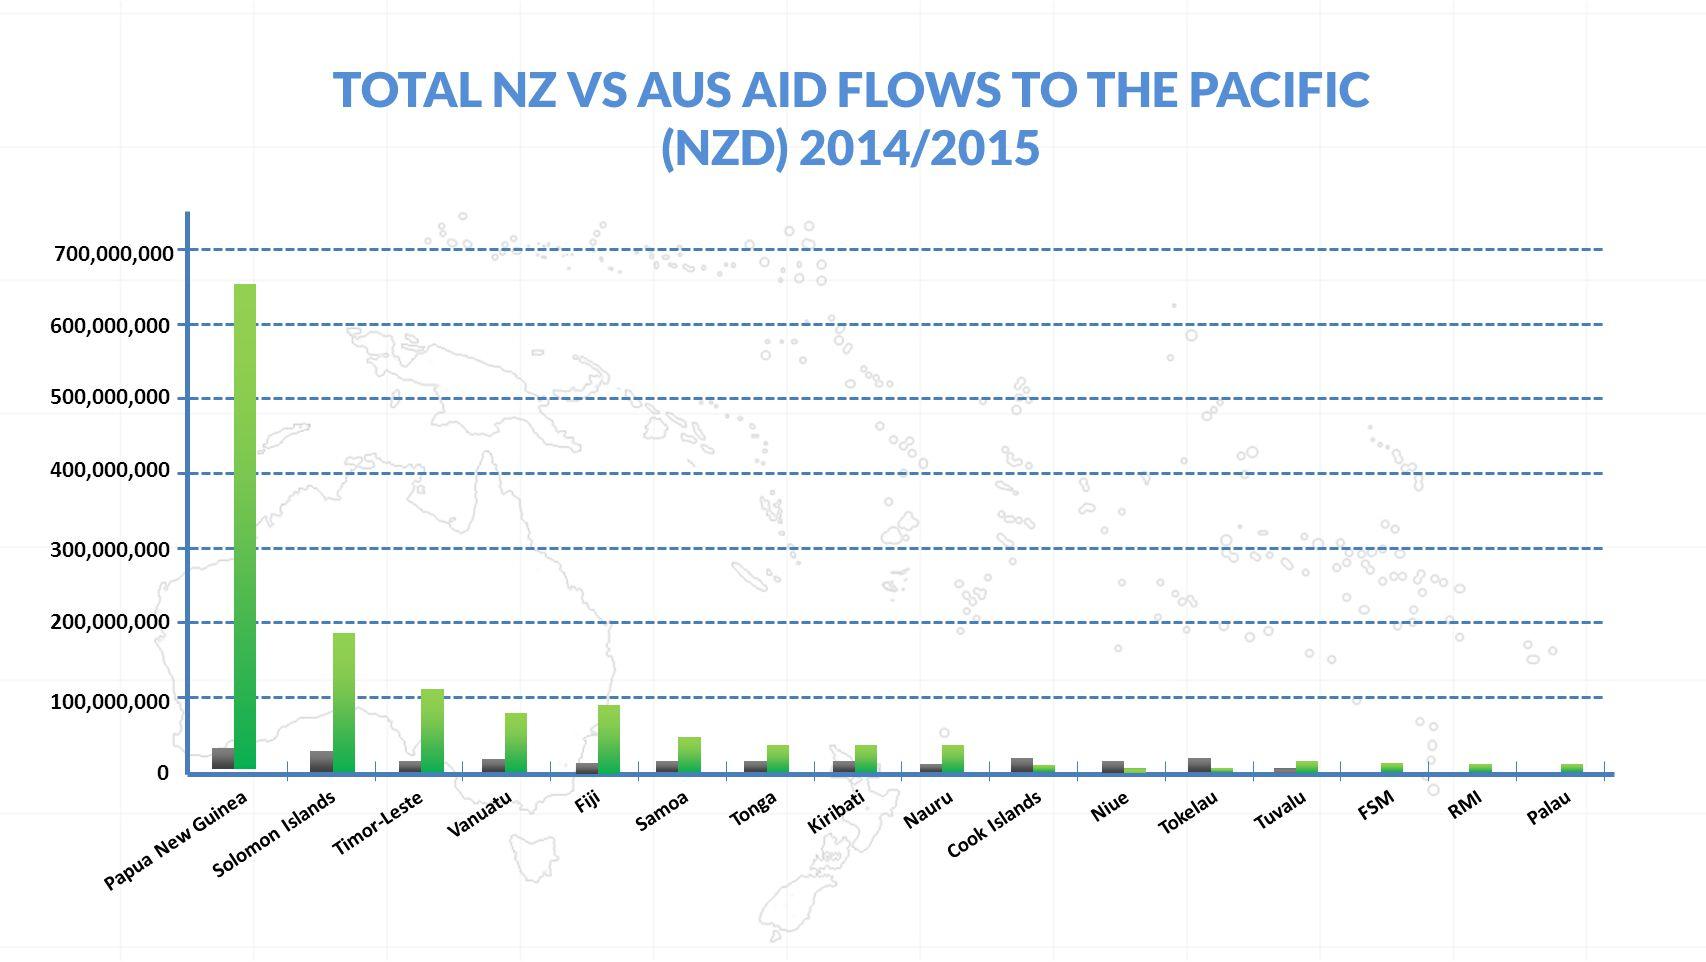 TOTAL NZ VS AUS AID FLOWS TO THE PACIFIC (NZD) 2014/2015 Papua New GuineaSolomon IslandsTimor-LesteVanuatuFijiSamoaTongaKiribatiNauruCook IslandsNiueTokelauTuvaluFSMRMIPalau 0 500,000,000 400,000,000 300,000,000 200,000,000 100,000,000 600,000,000 700,000,000